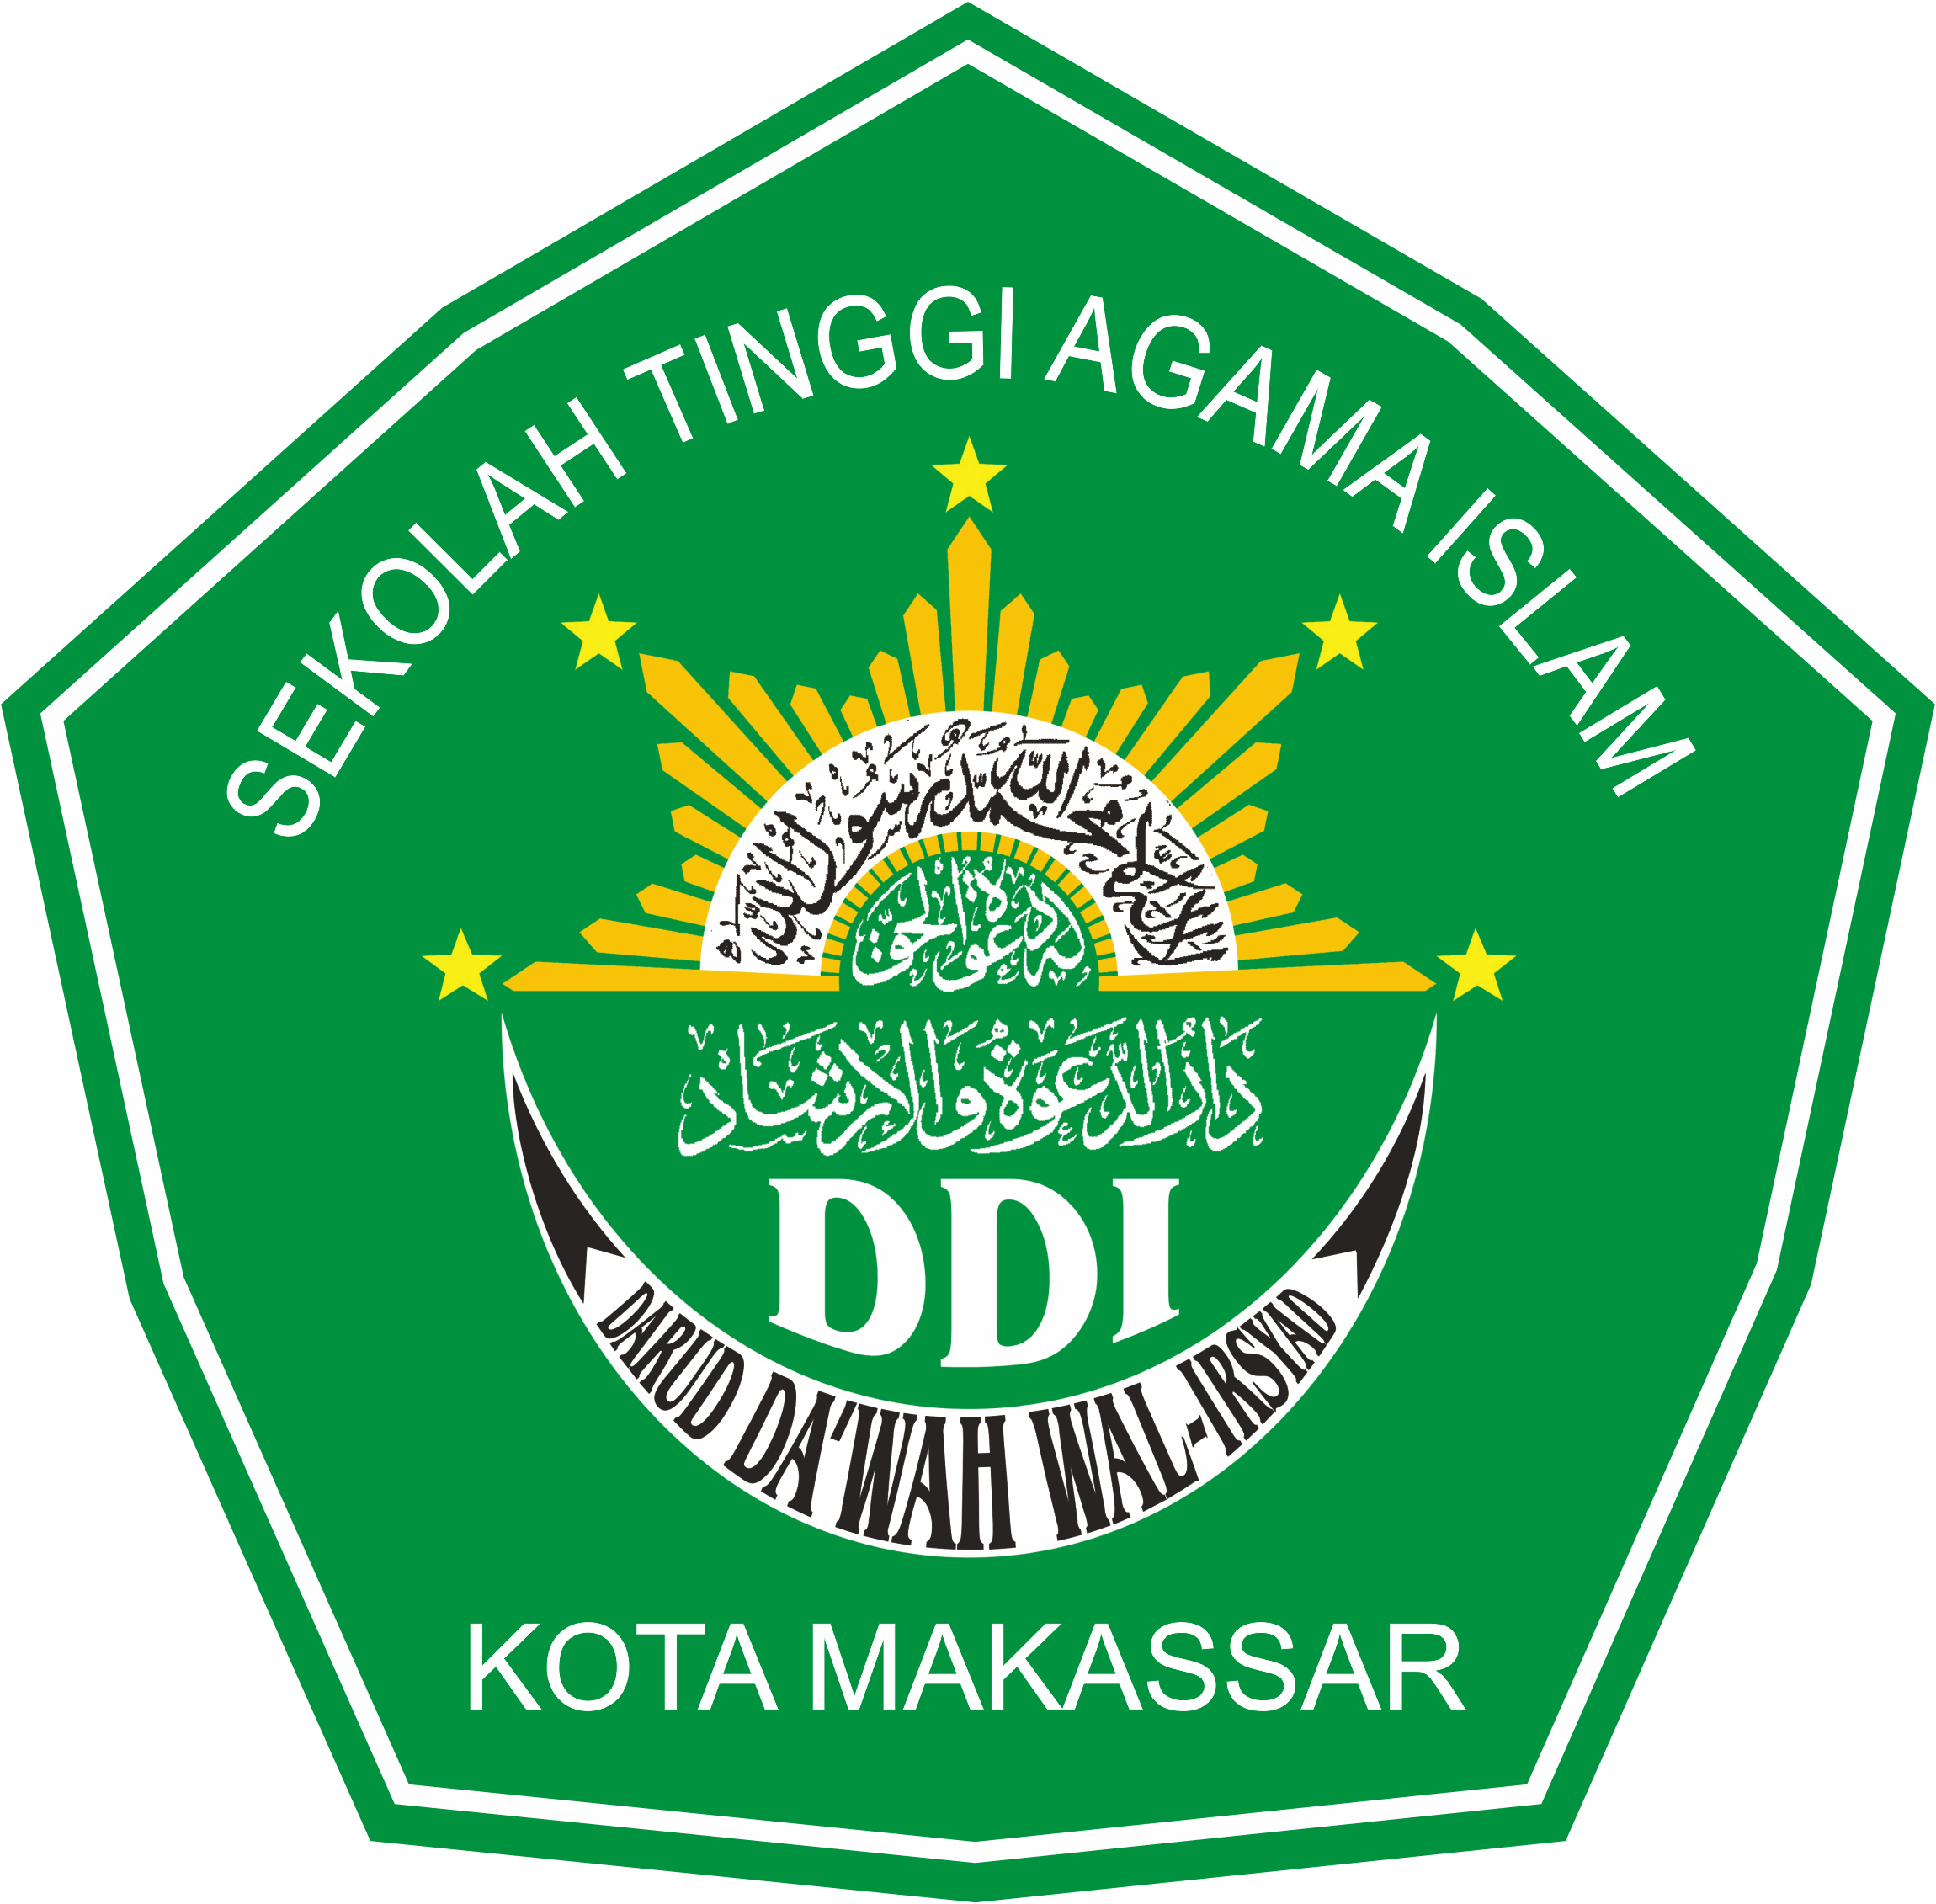 STAI-DDI KOTA MAKASSAR